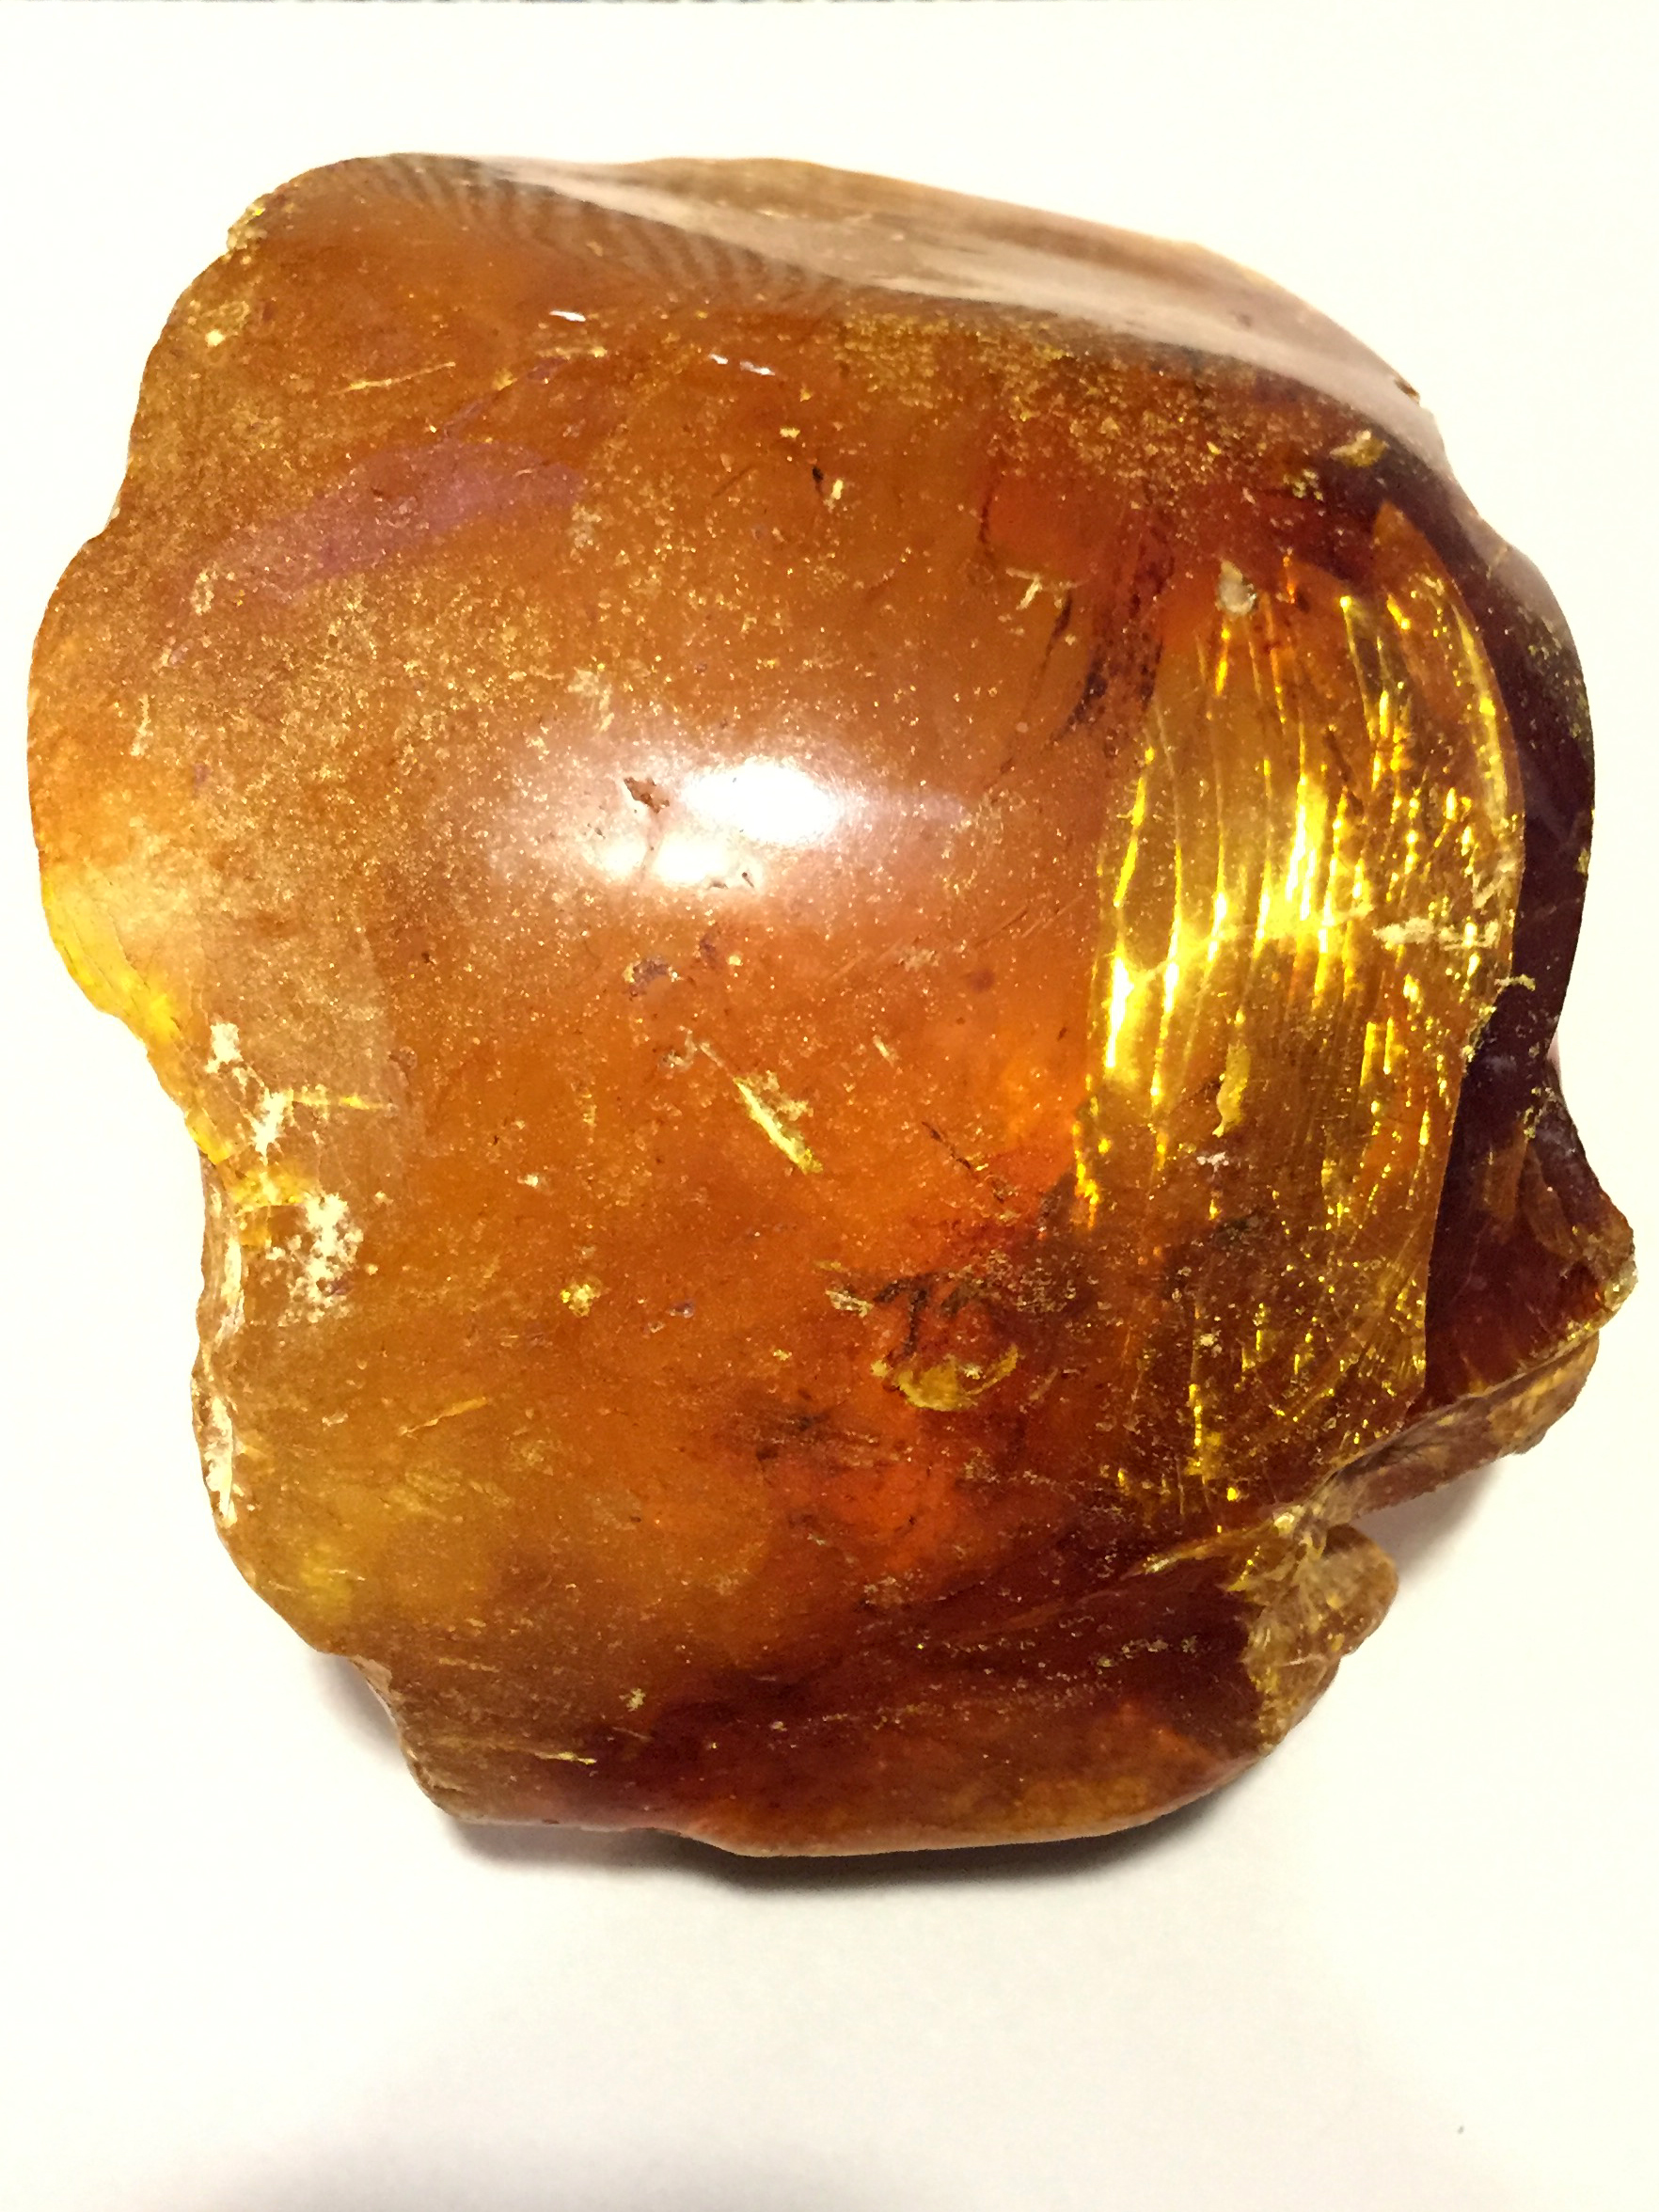 Fossilised Kauri Gum from Northland New Zealand